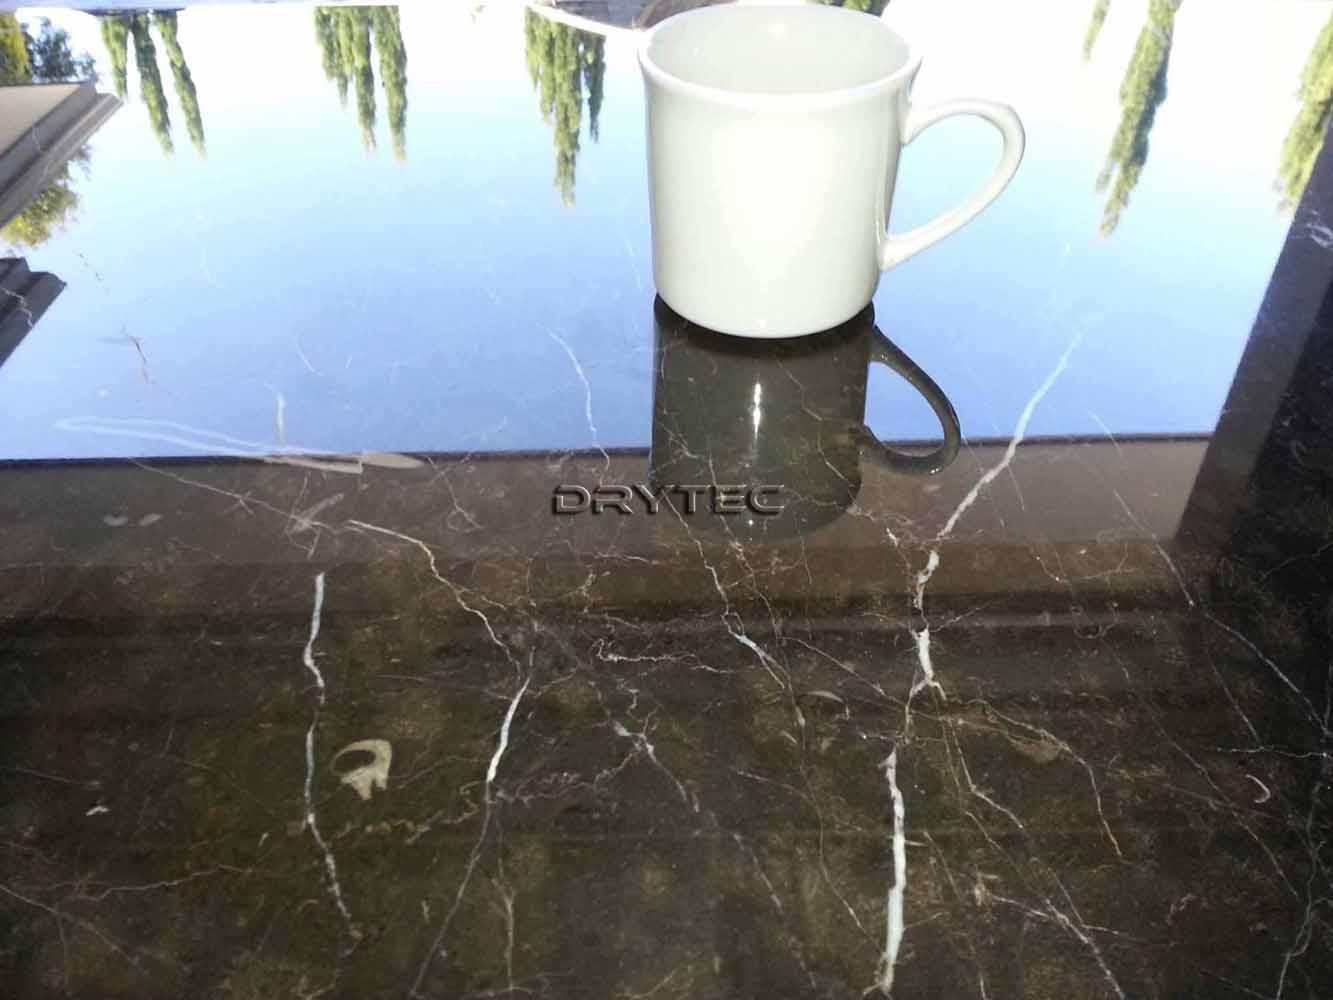 Natural Stone Restoration- Polishing - Grinding - Honing - Cleaning & Sealing